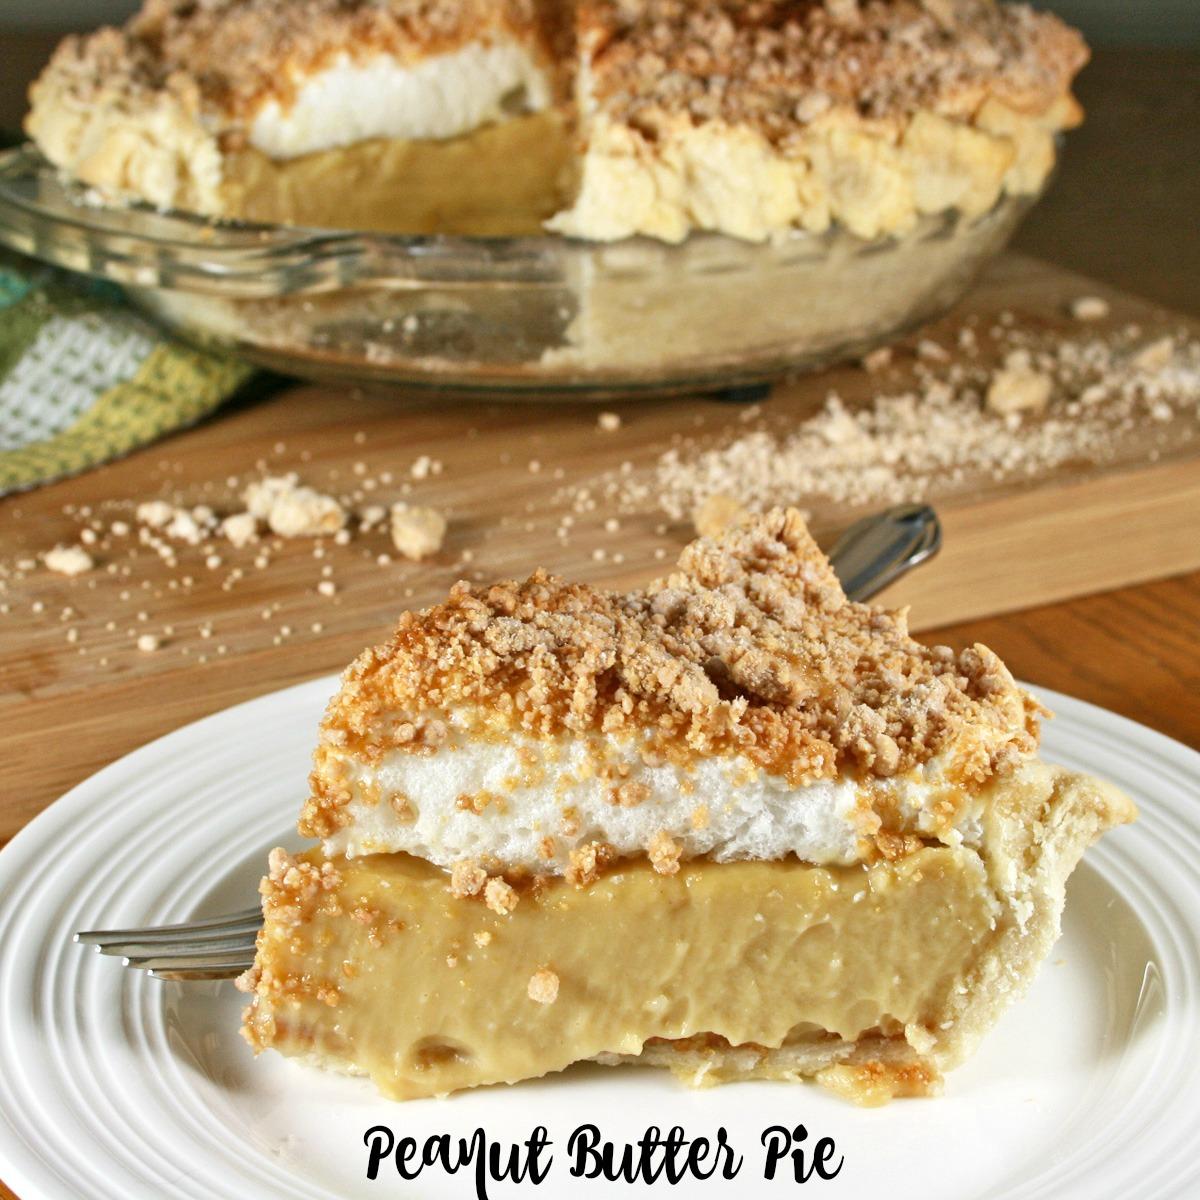 peanut butter pie baked